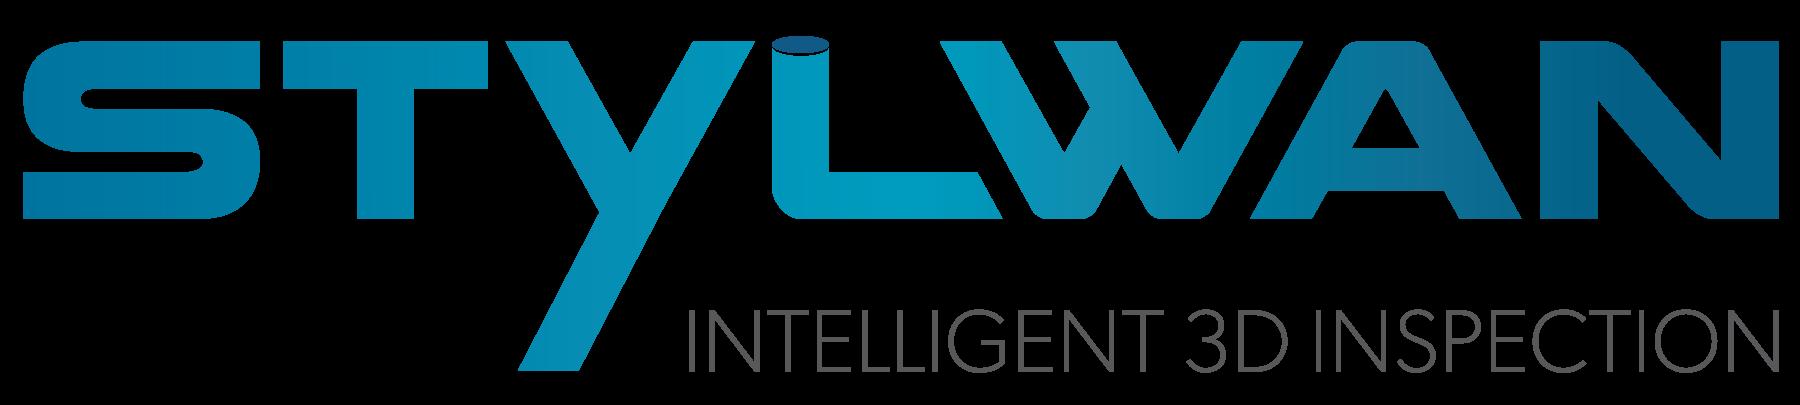 Stylwan_Logo_FullColor_Gradient